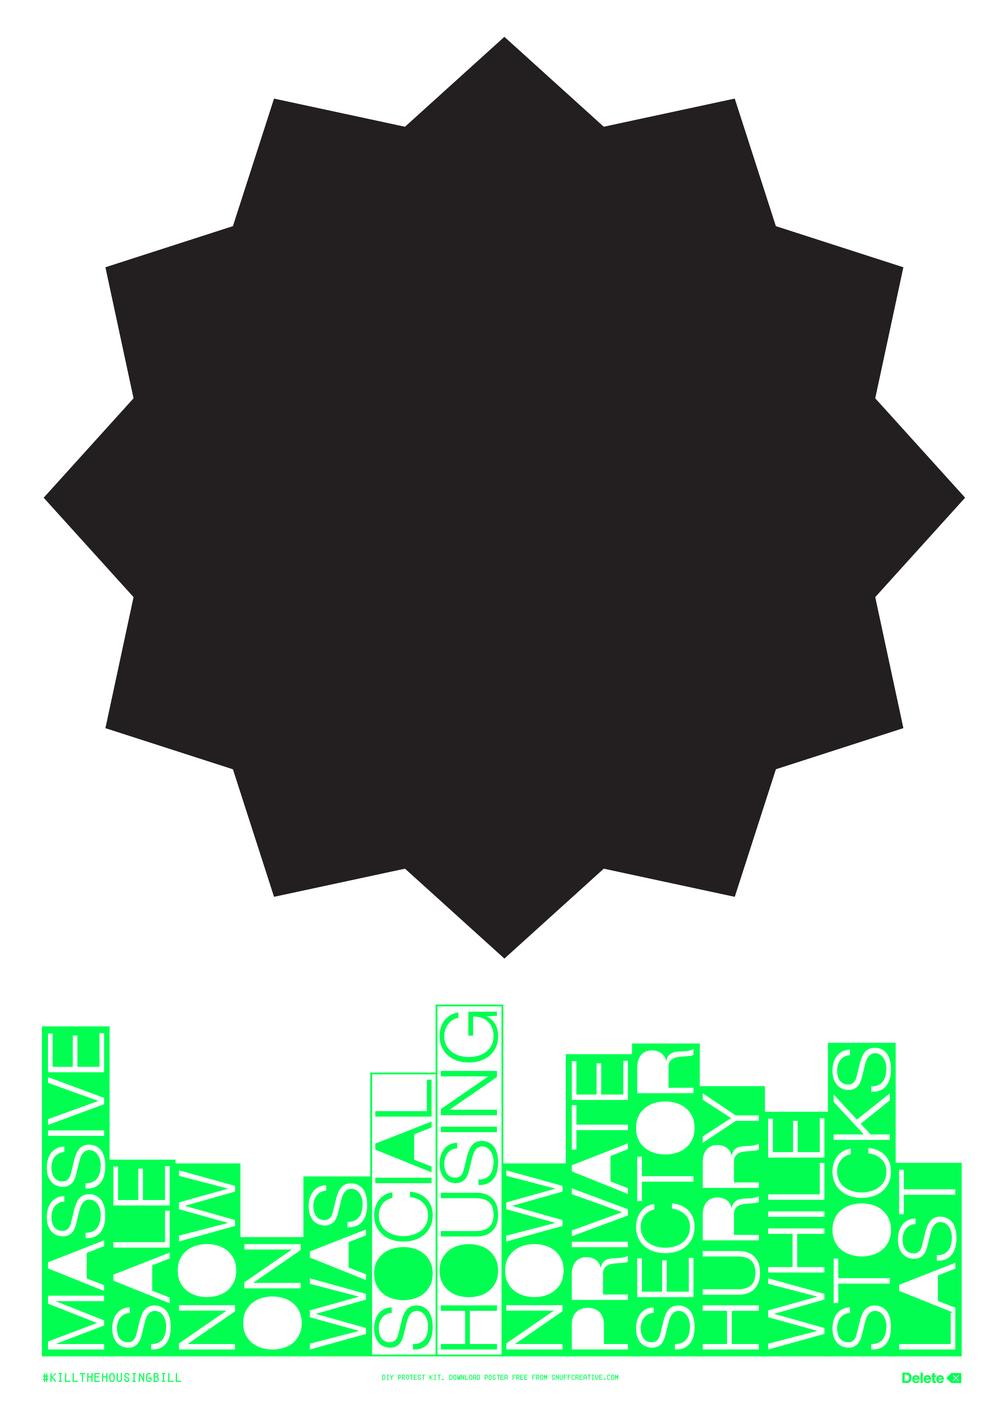 MASSIVE SALE TYPE POSTER_BLACK1-03.jpg